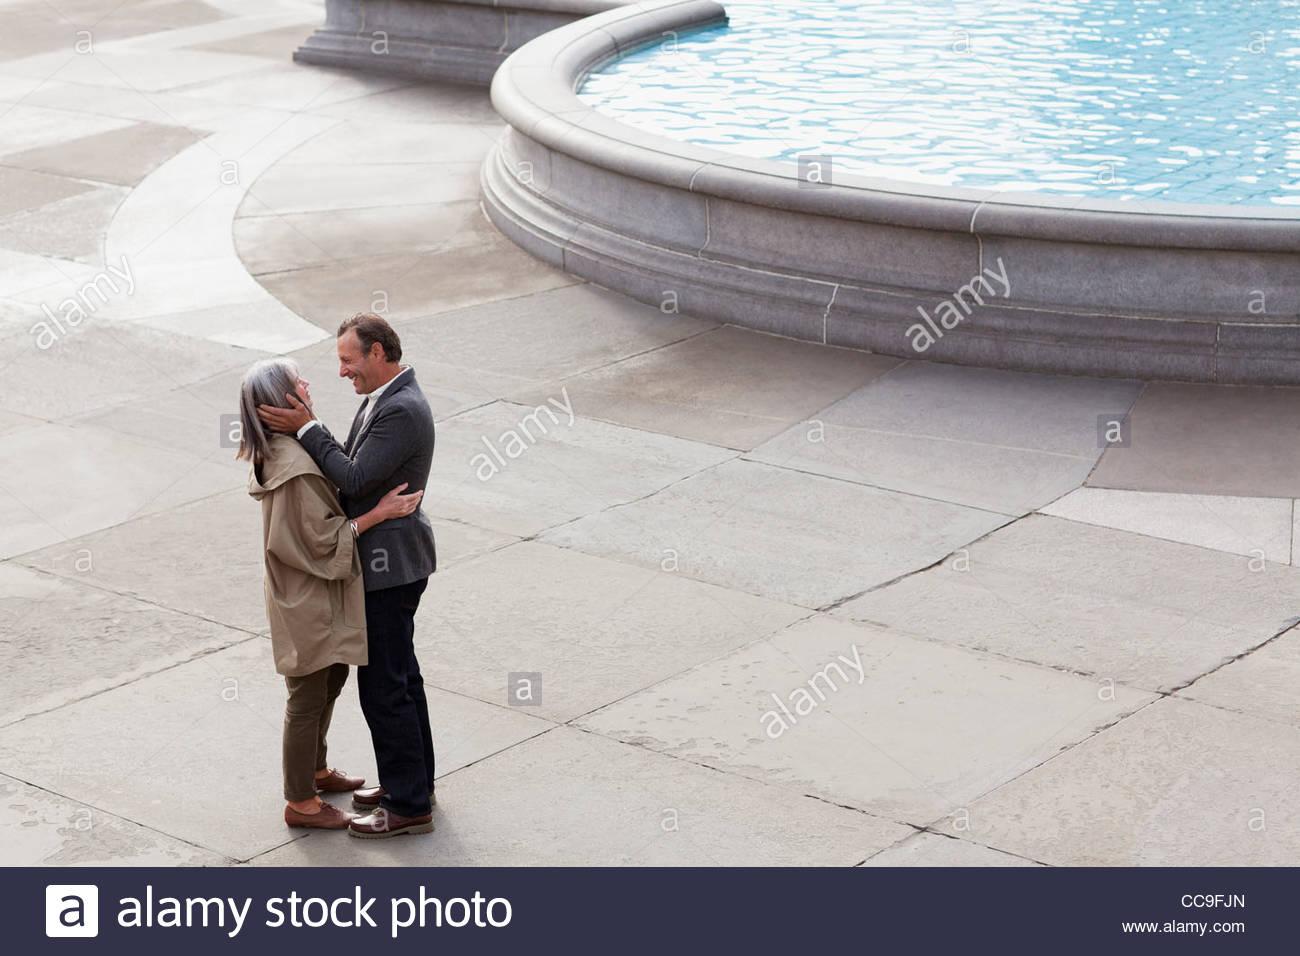 Couple hugging face to face near urban fountain - Stock Image